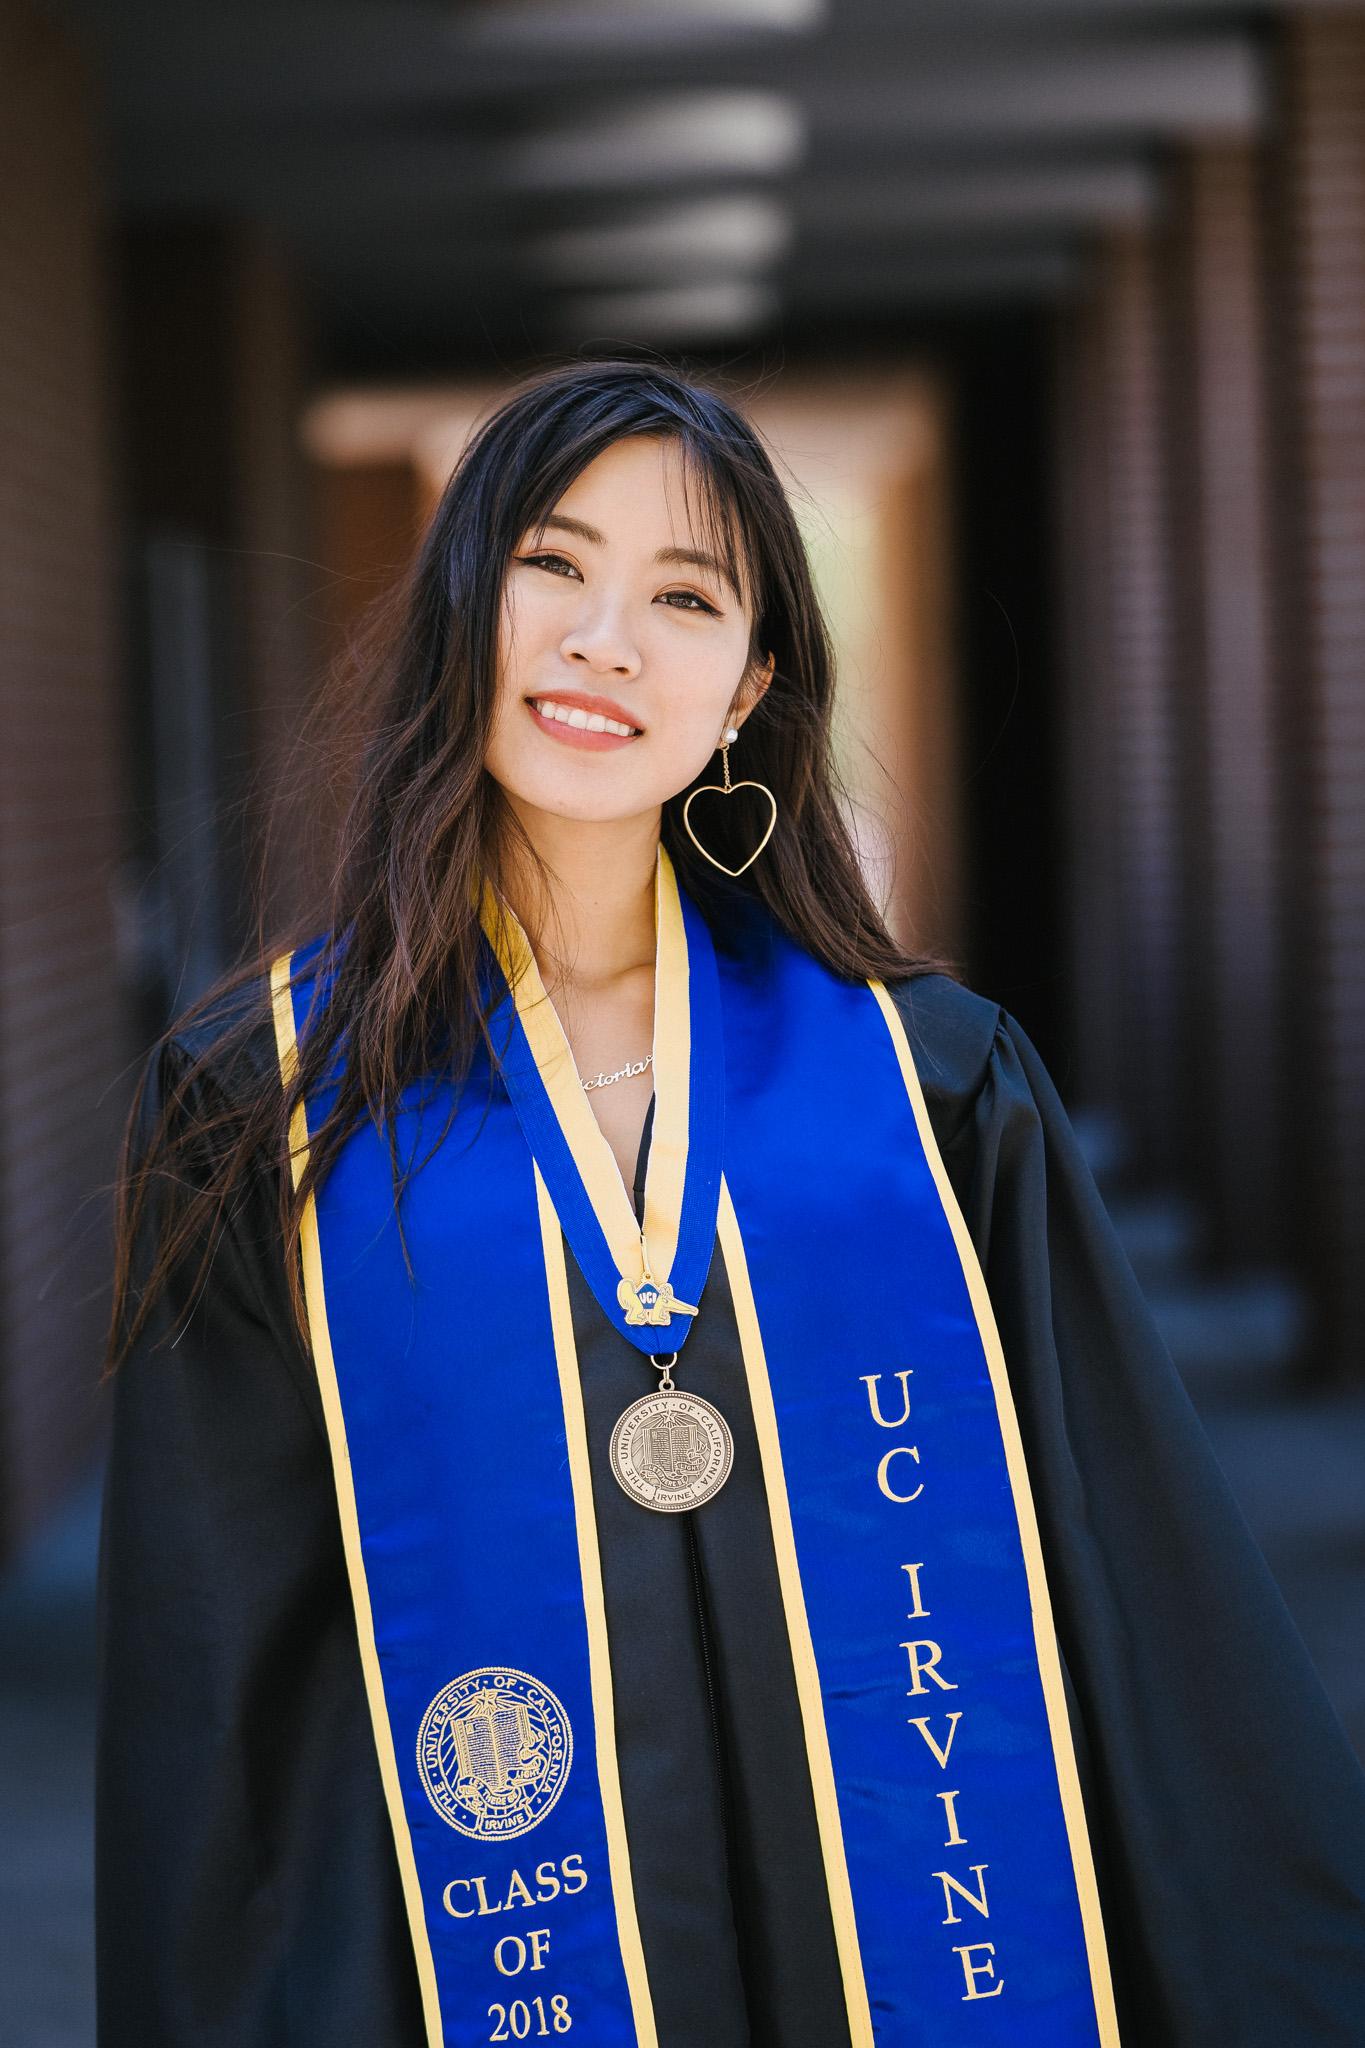 [5-16-2018] Vi's Graduation Photoshoot227.jpg